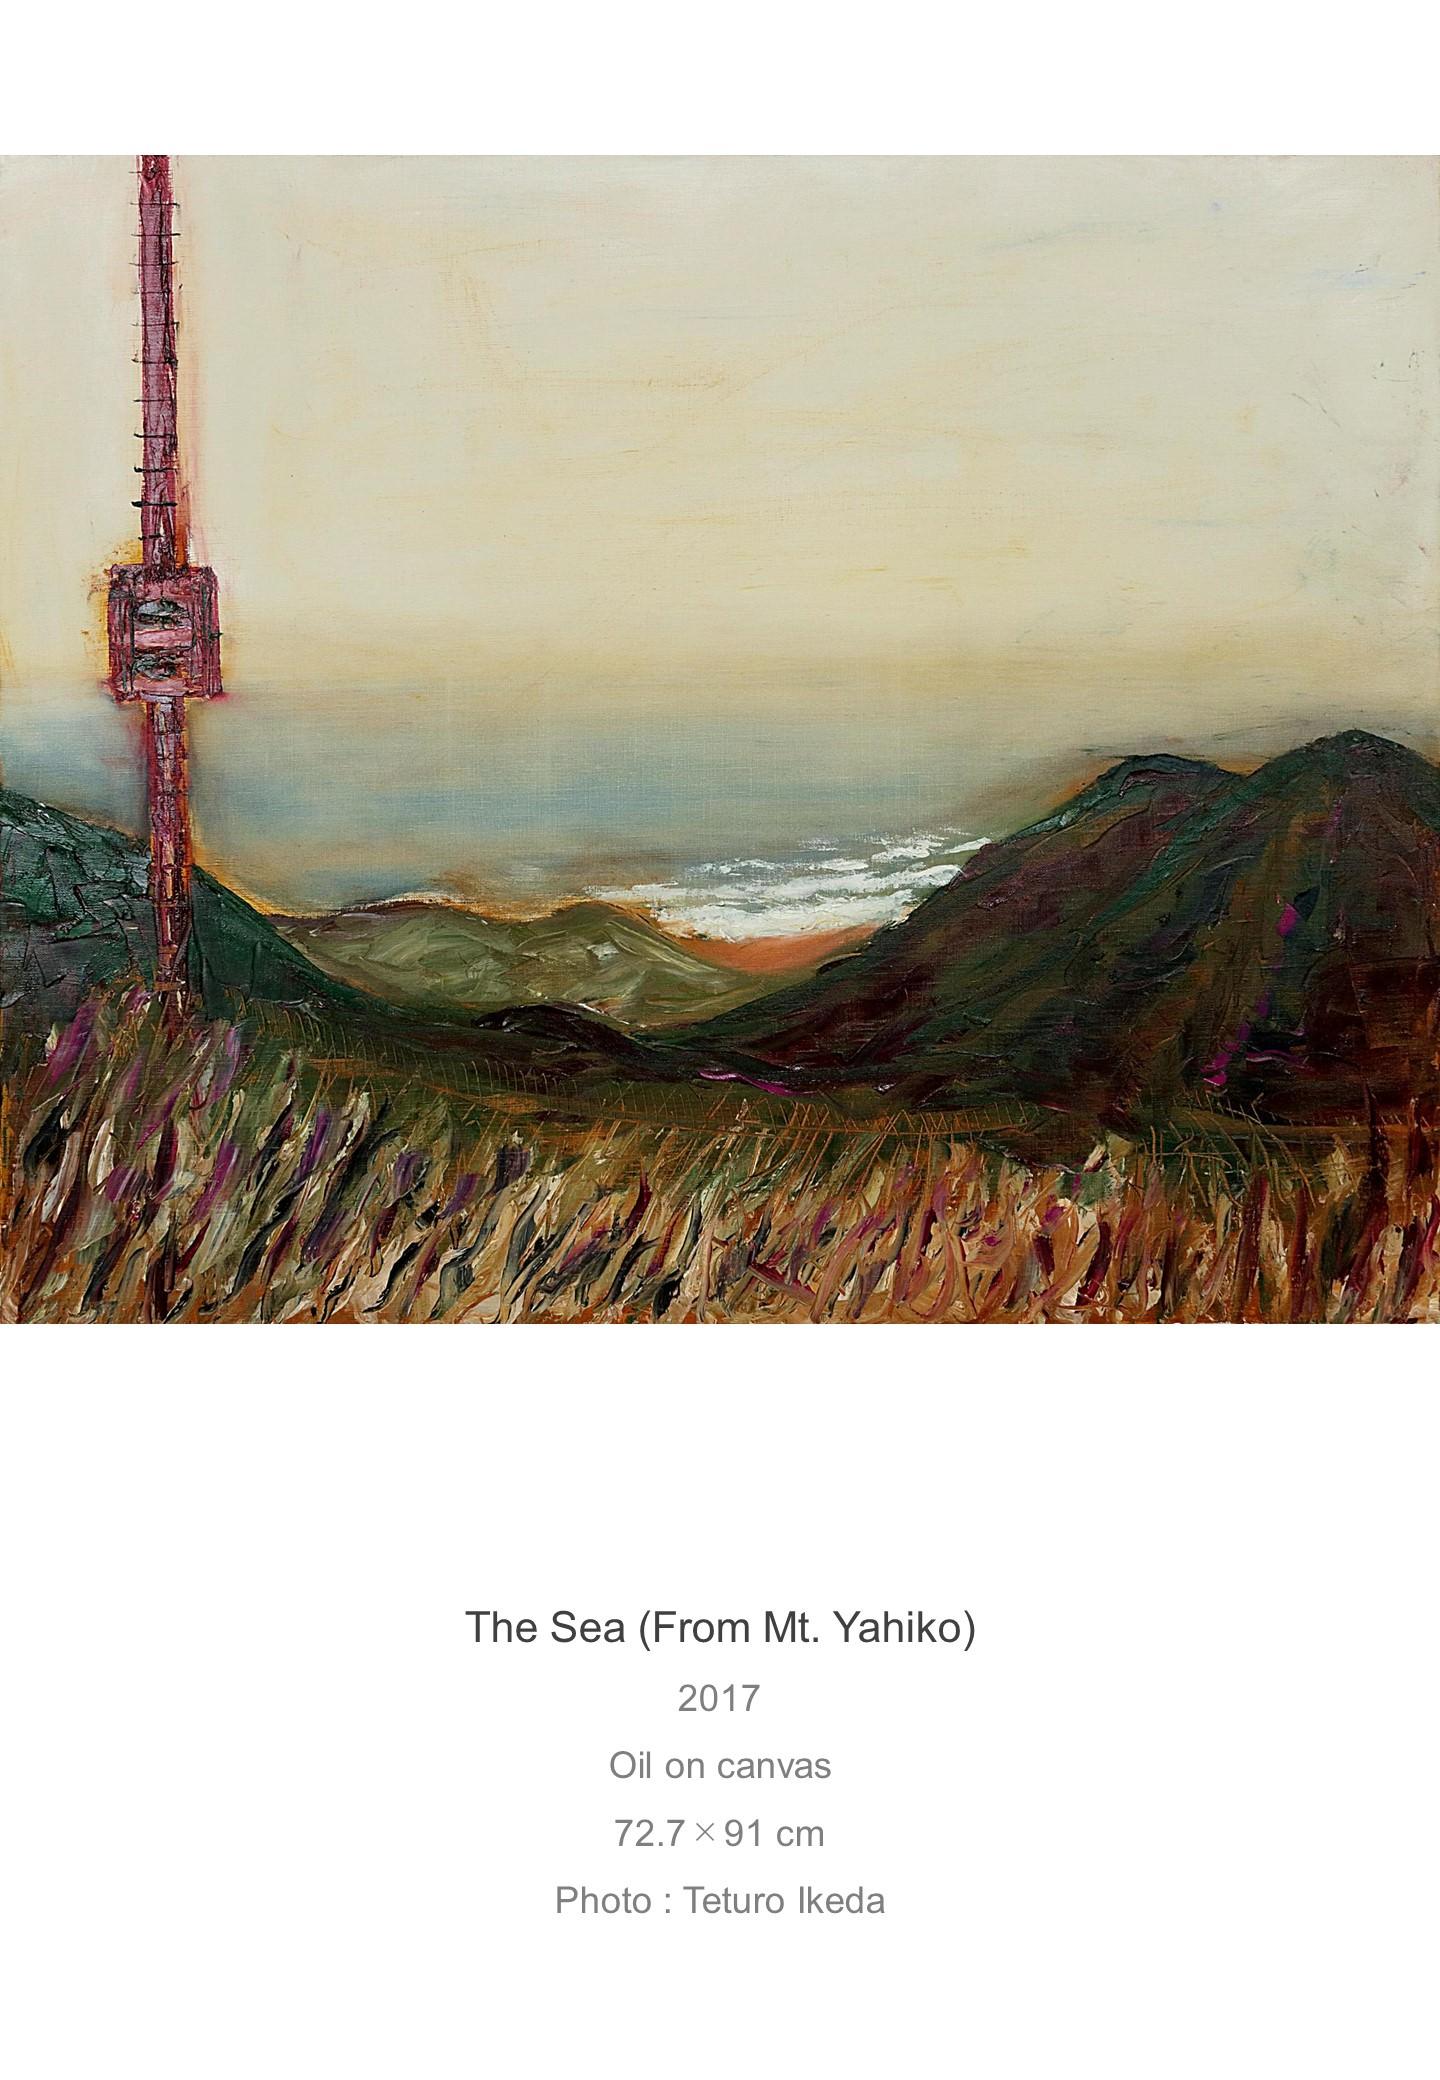 Shota Imai's Artwork of The sea (From Mt, Yahiko)